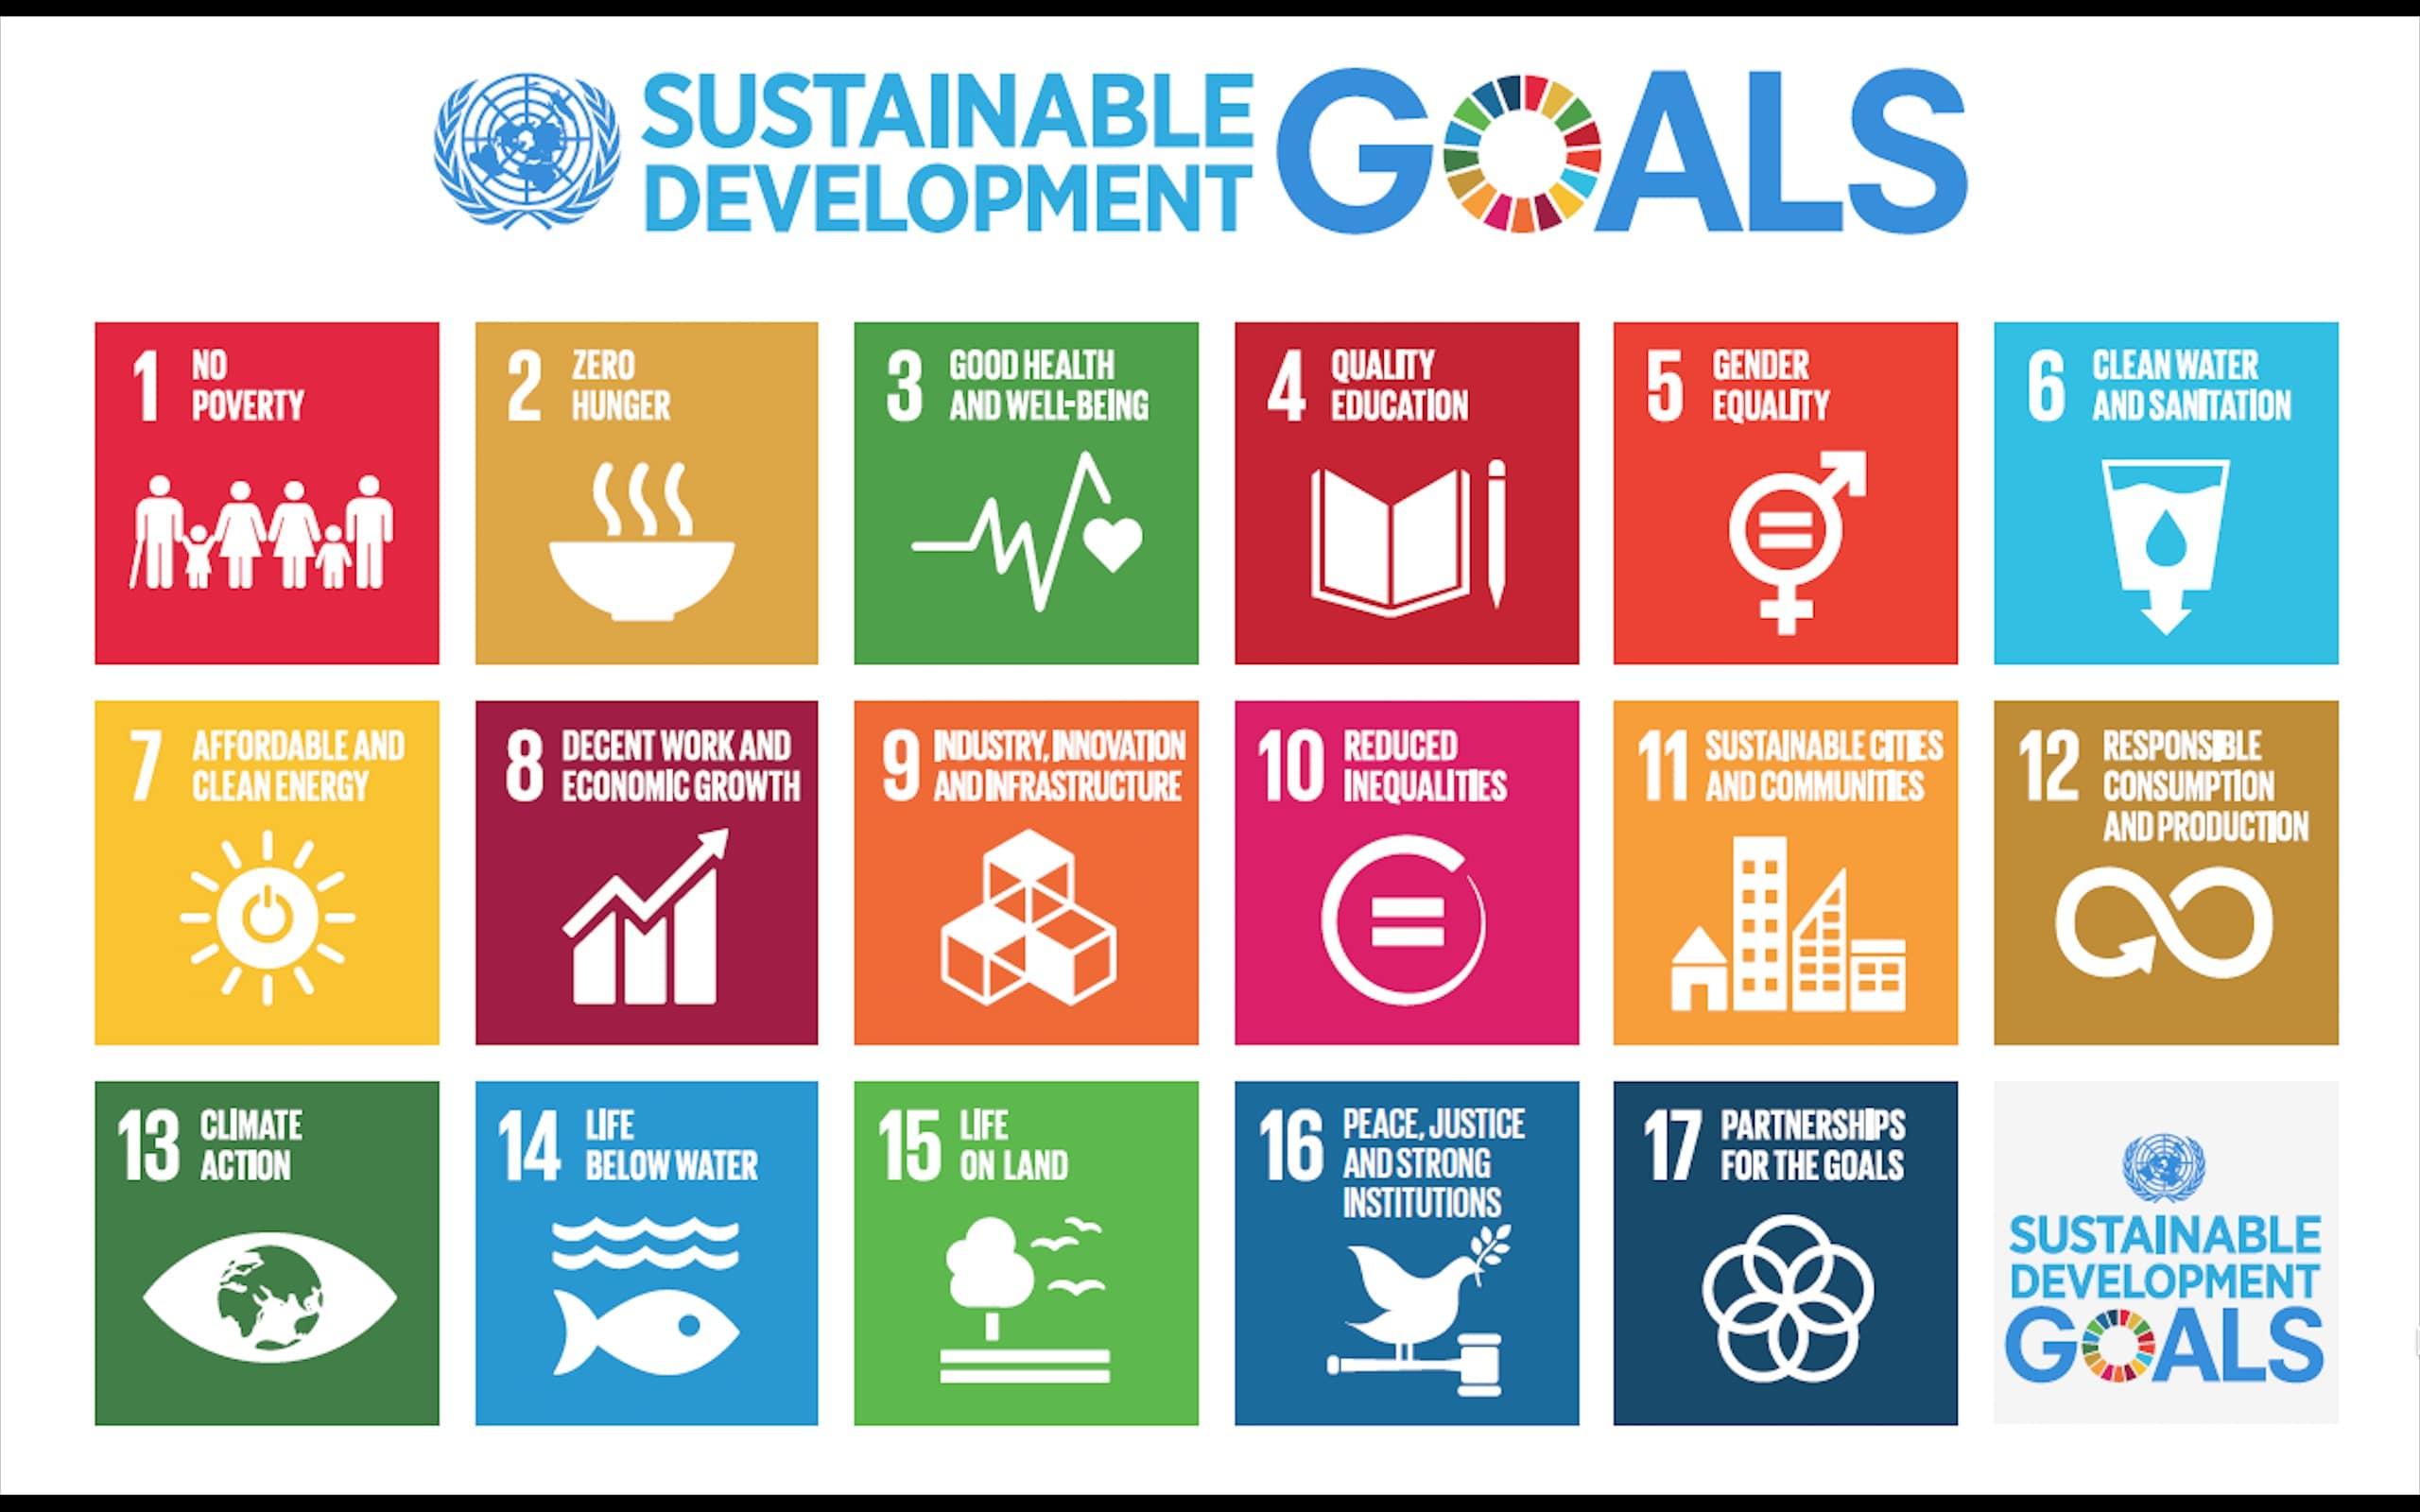 banner containing 17 SDGs